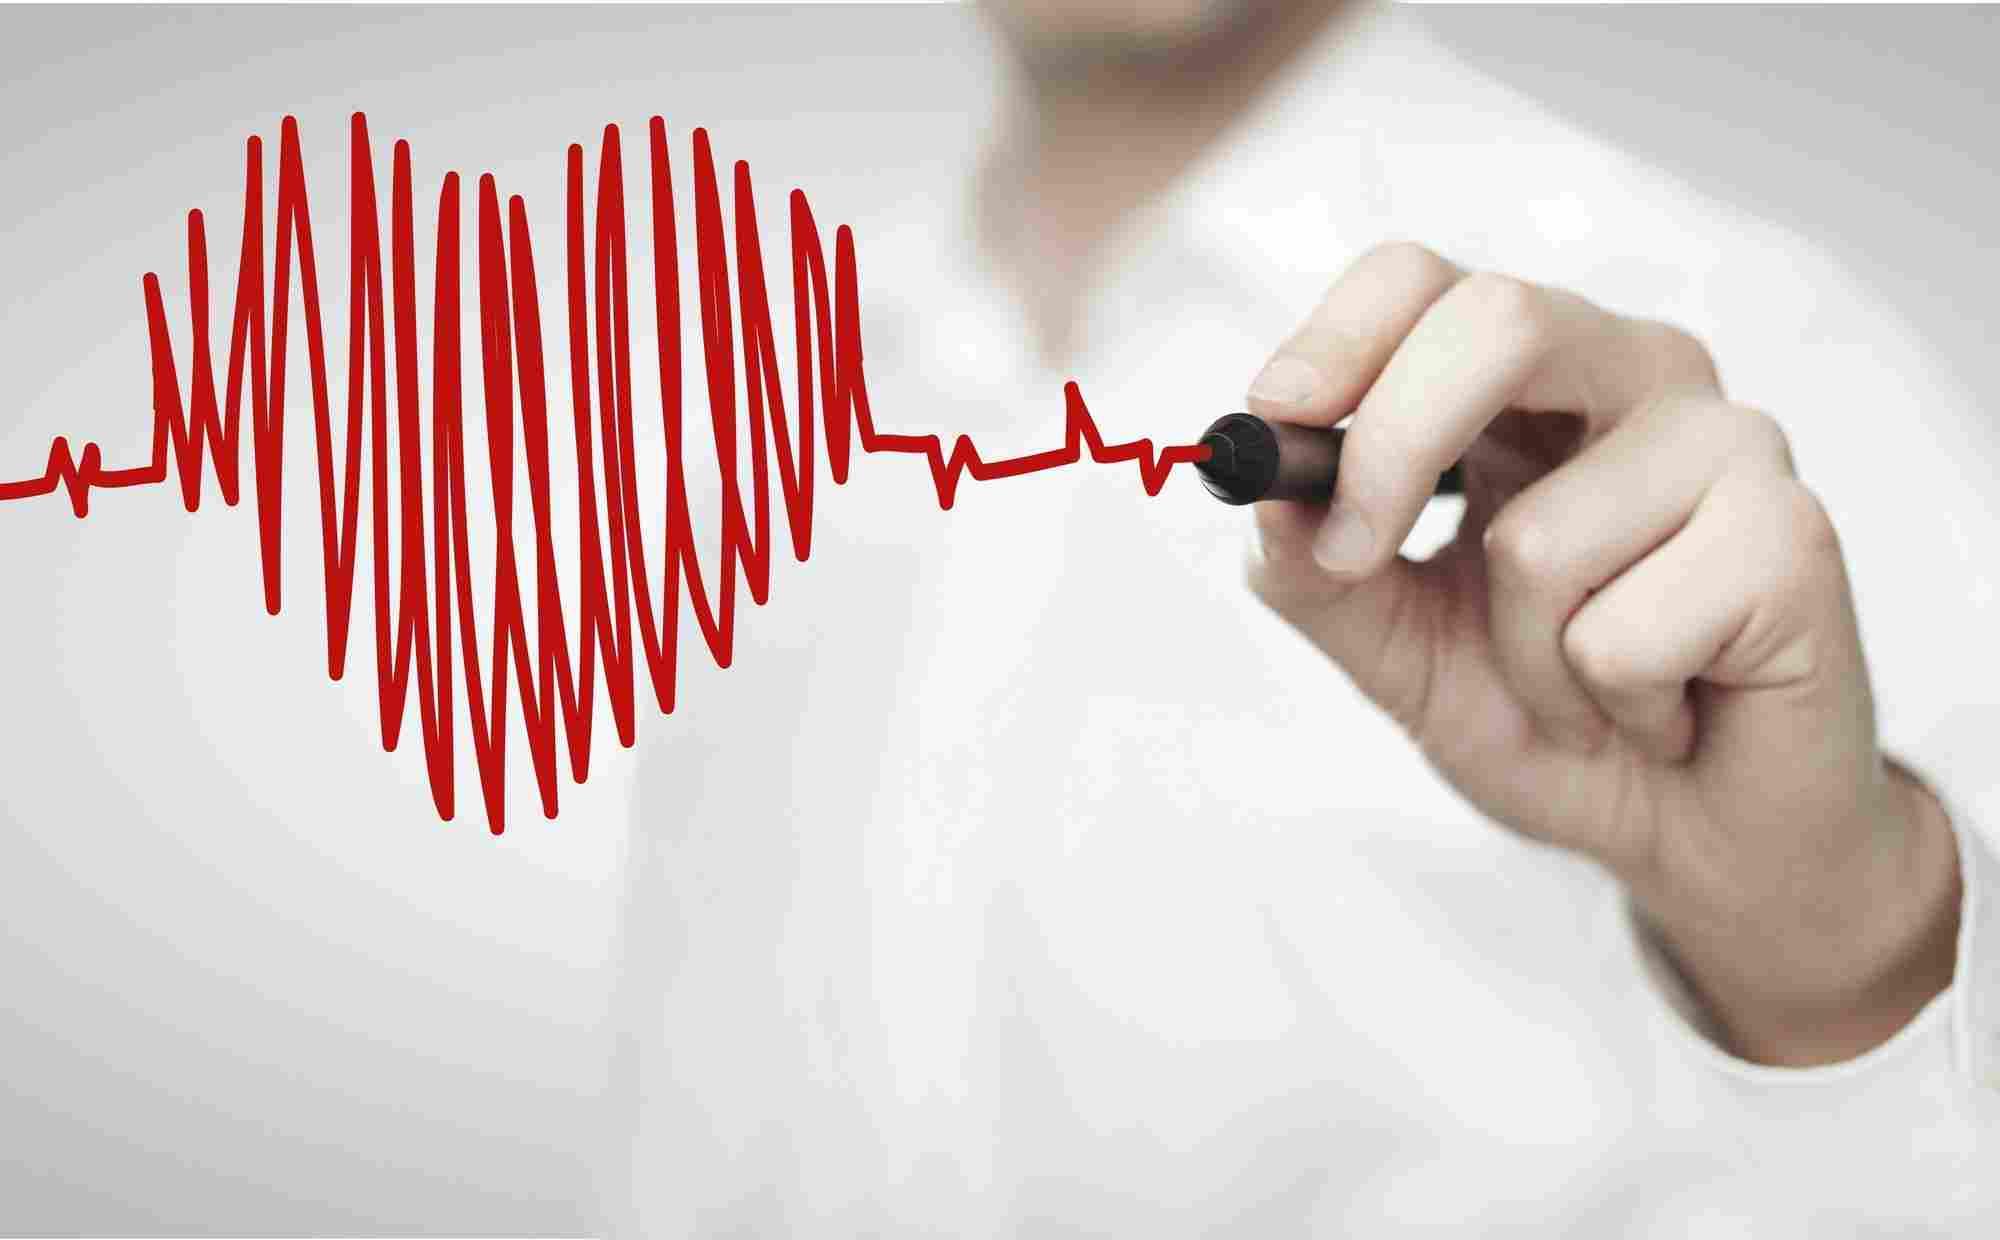 https://rosscreekxray.com/wp-content/uploads/2015/12/heart-health-1.jpg